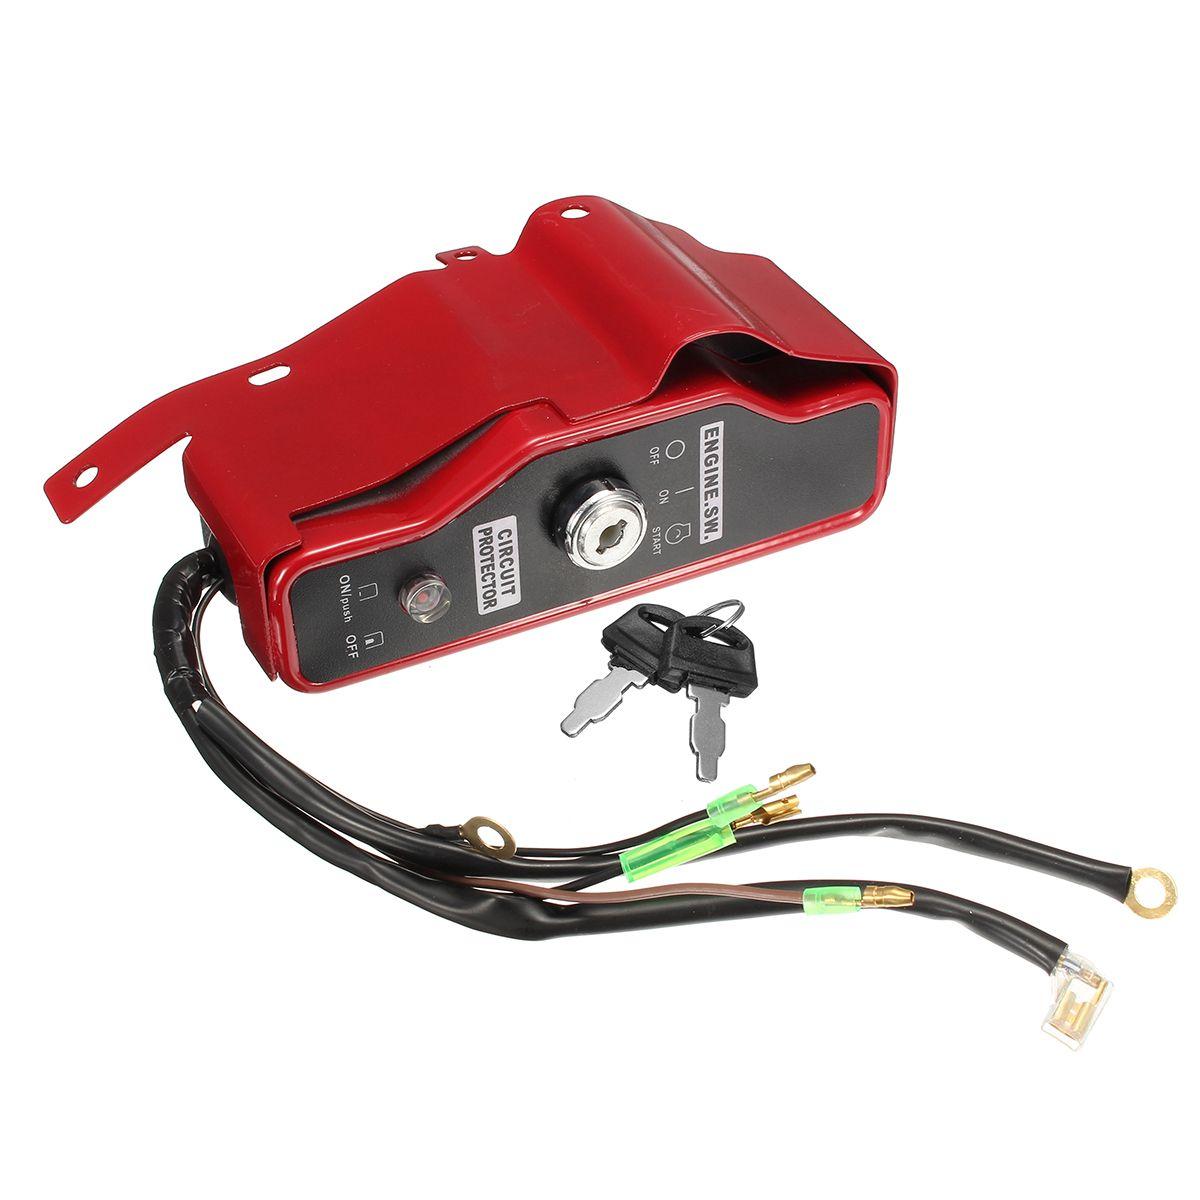 Ignition Switch Key Panel Electric Start For Honda Gx340 Gx390 11hp 13hp Engine Honda Ignite Electrical Equipment